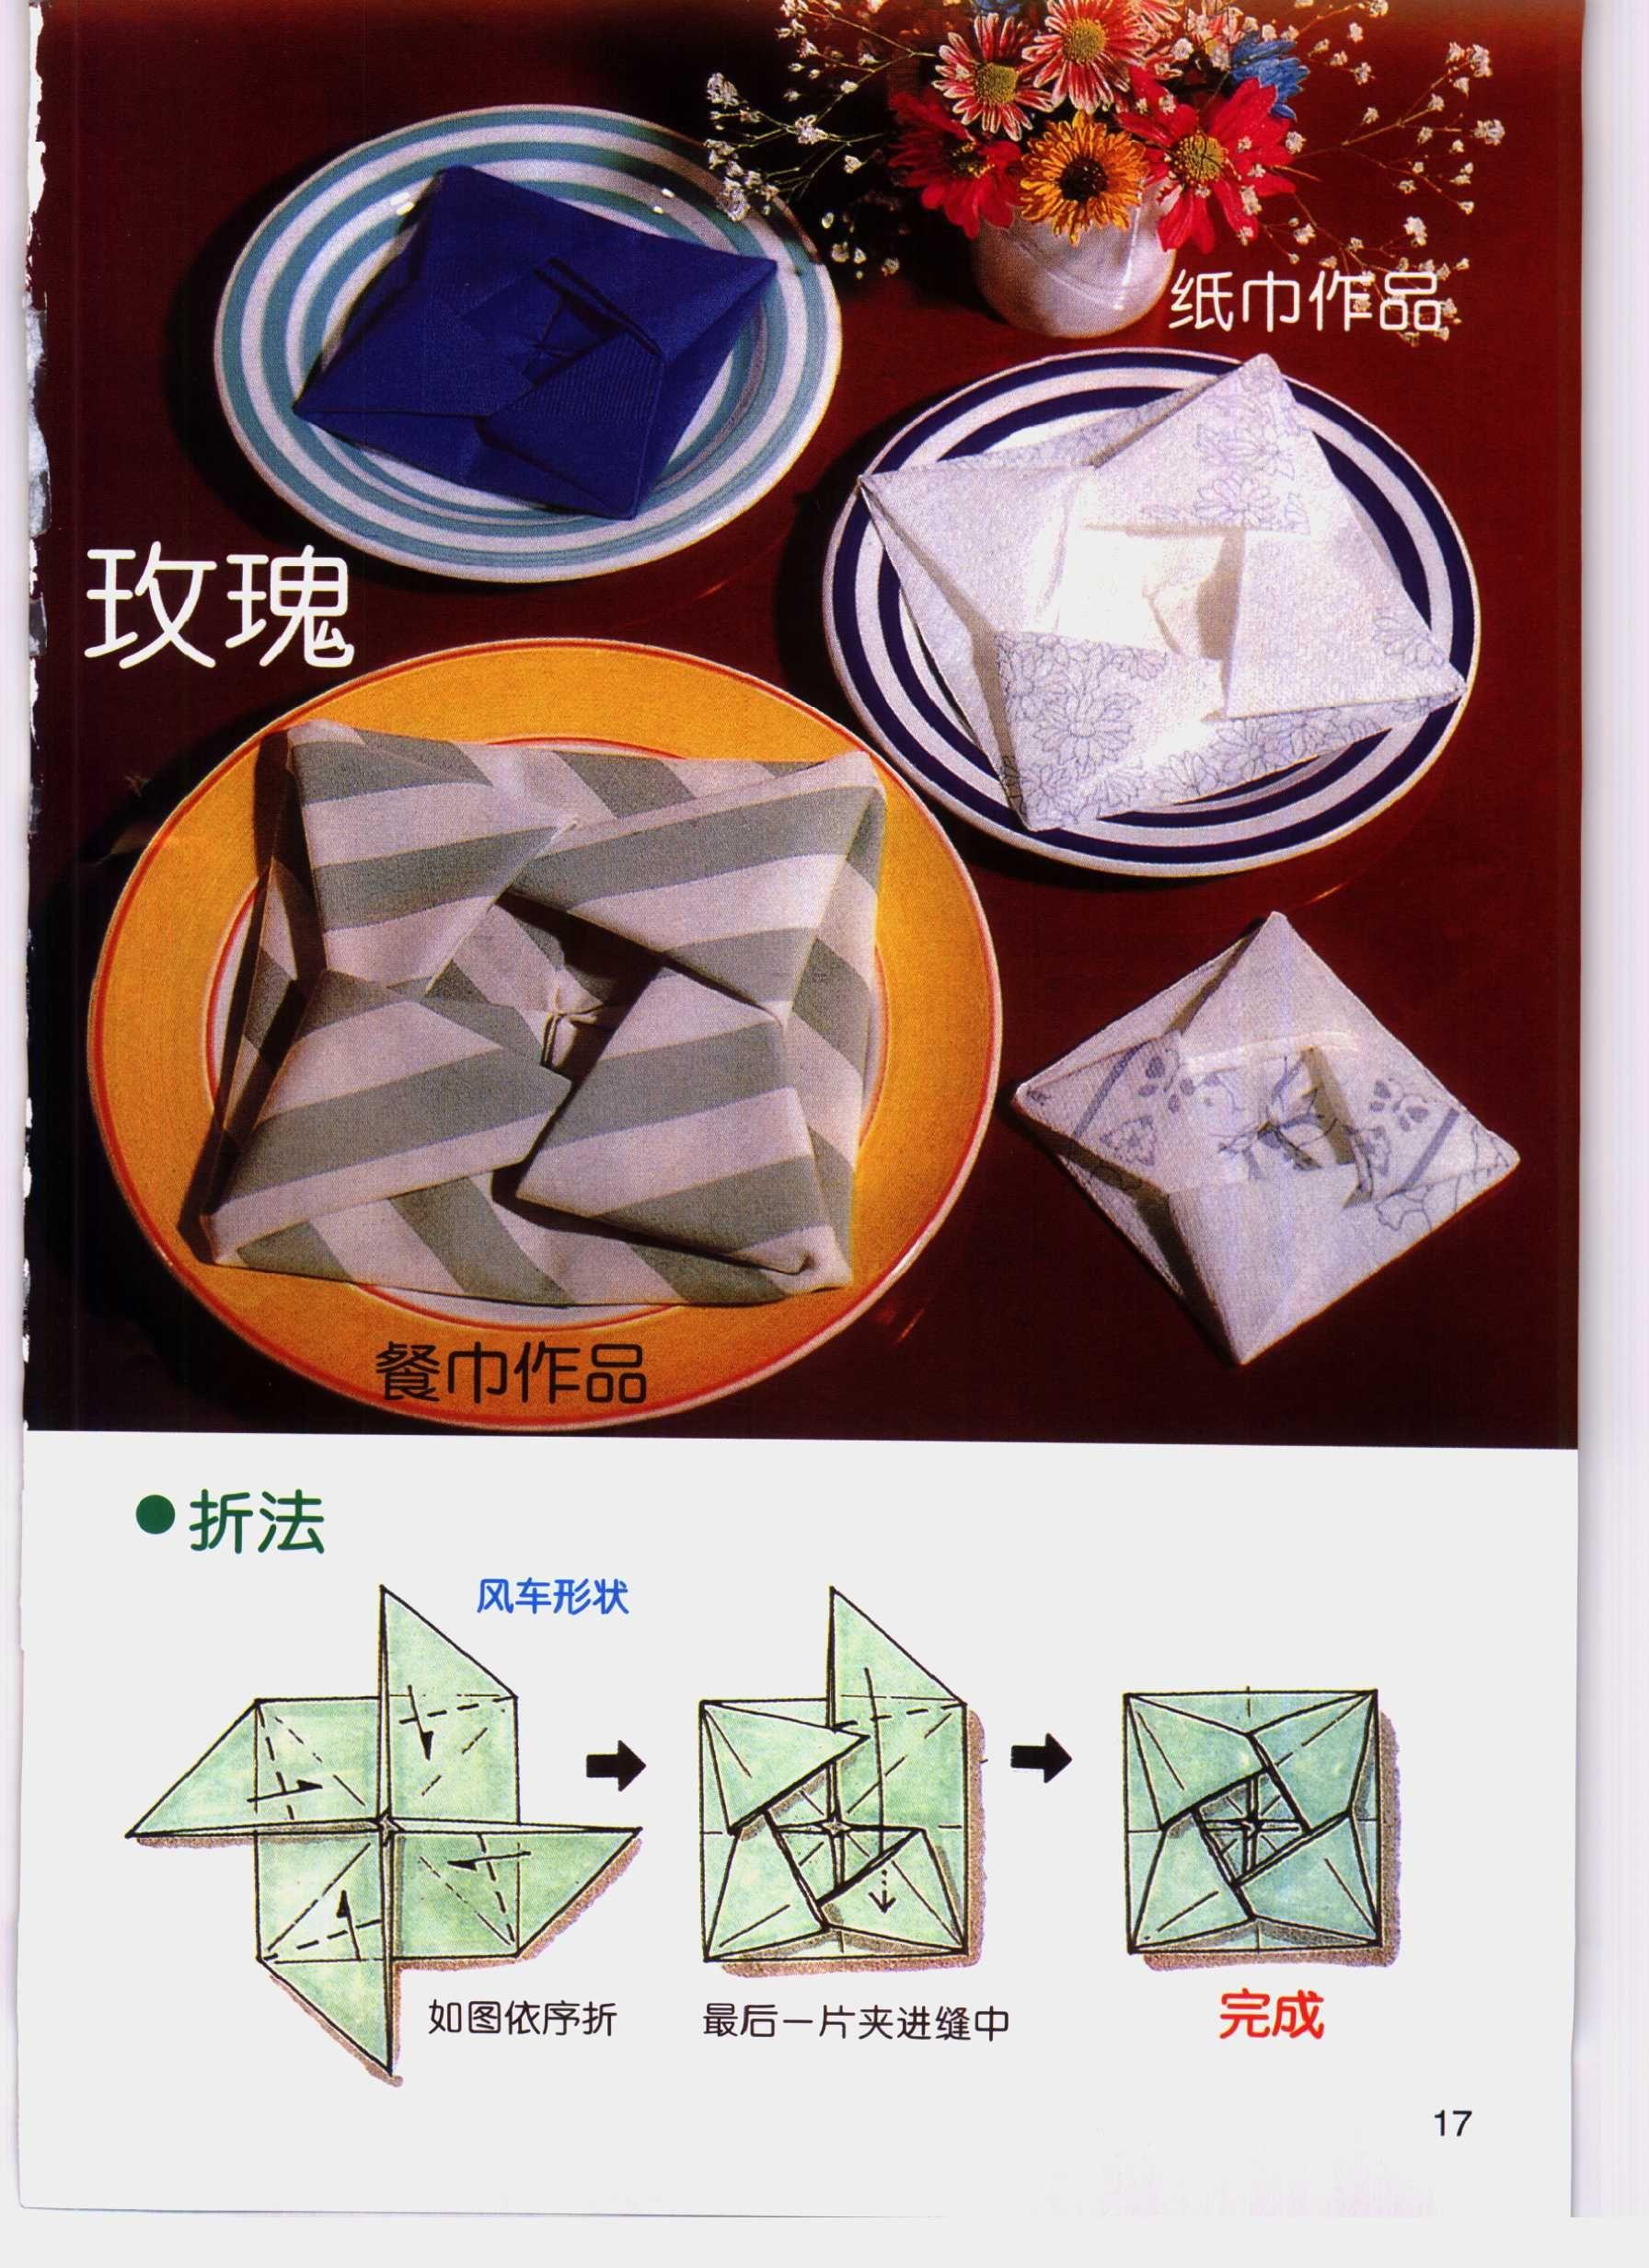 Fold Napkins Rose Napkin Folding Toilet Paper Origami Napkin Rose